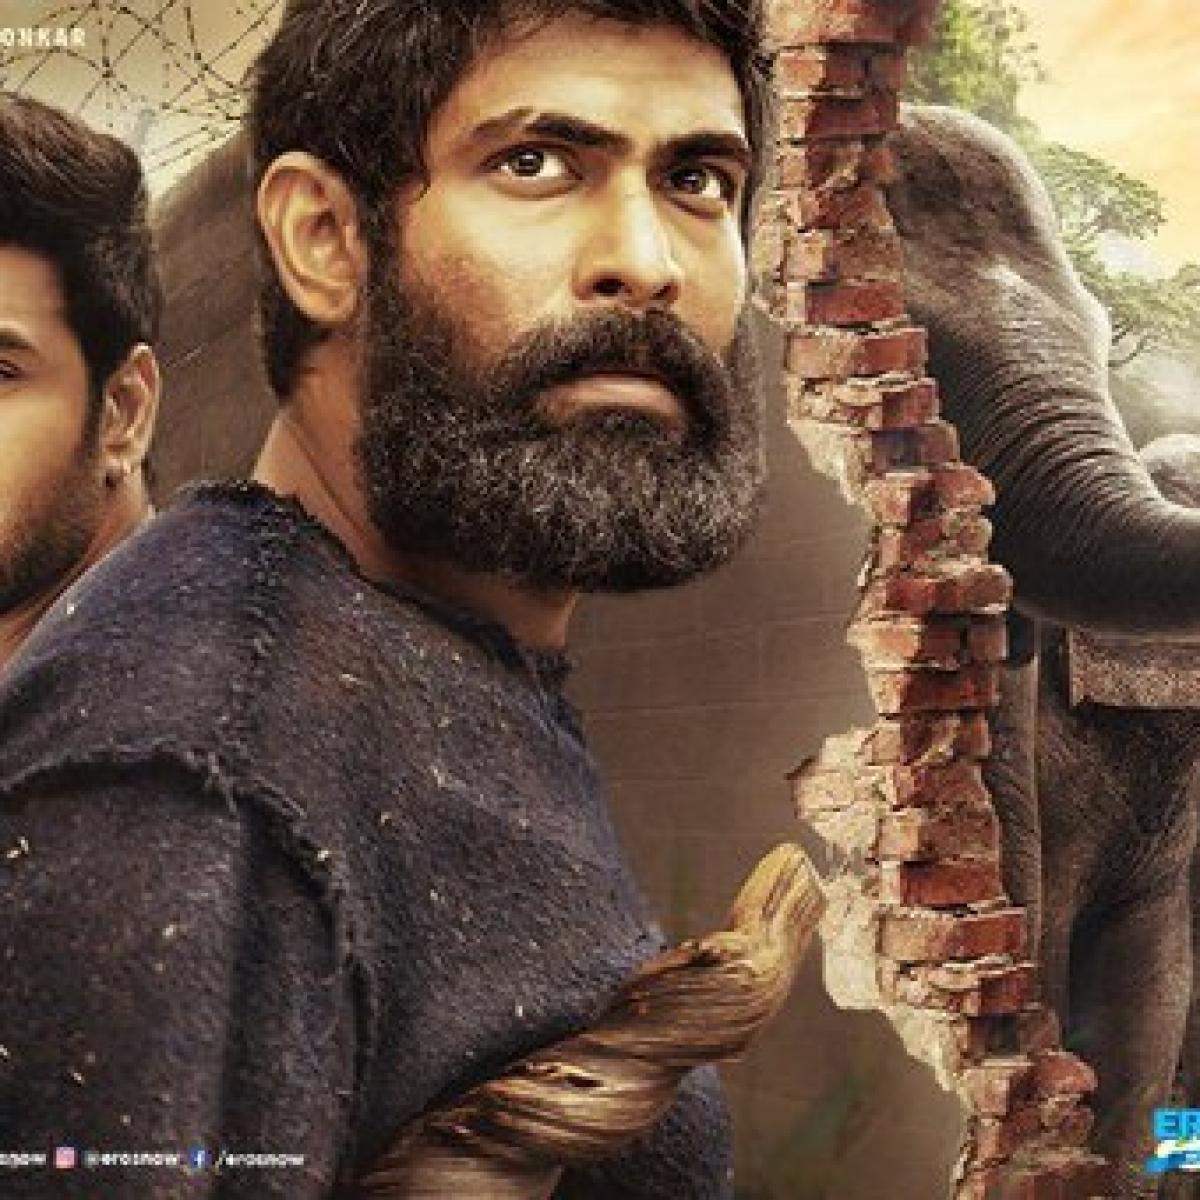 Rana Daggubati-starrer 'Haathi Mere Saathi's Hindi version put on hold due to COVID-19 pandemic